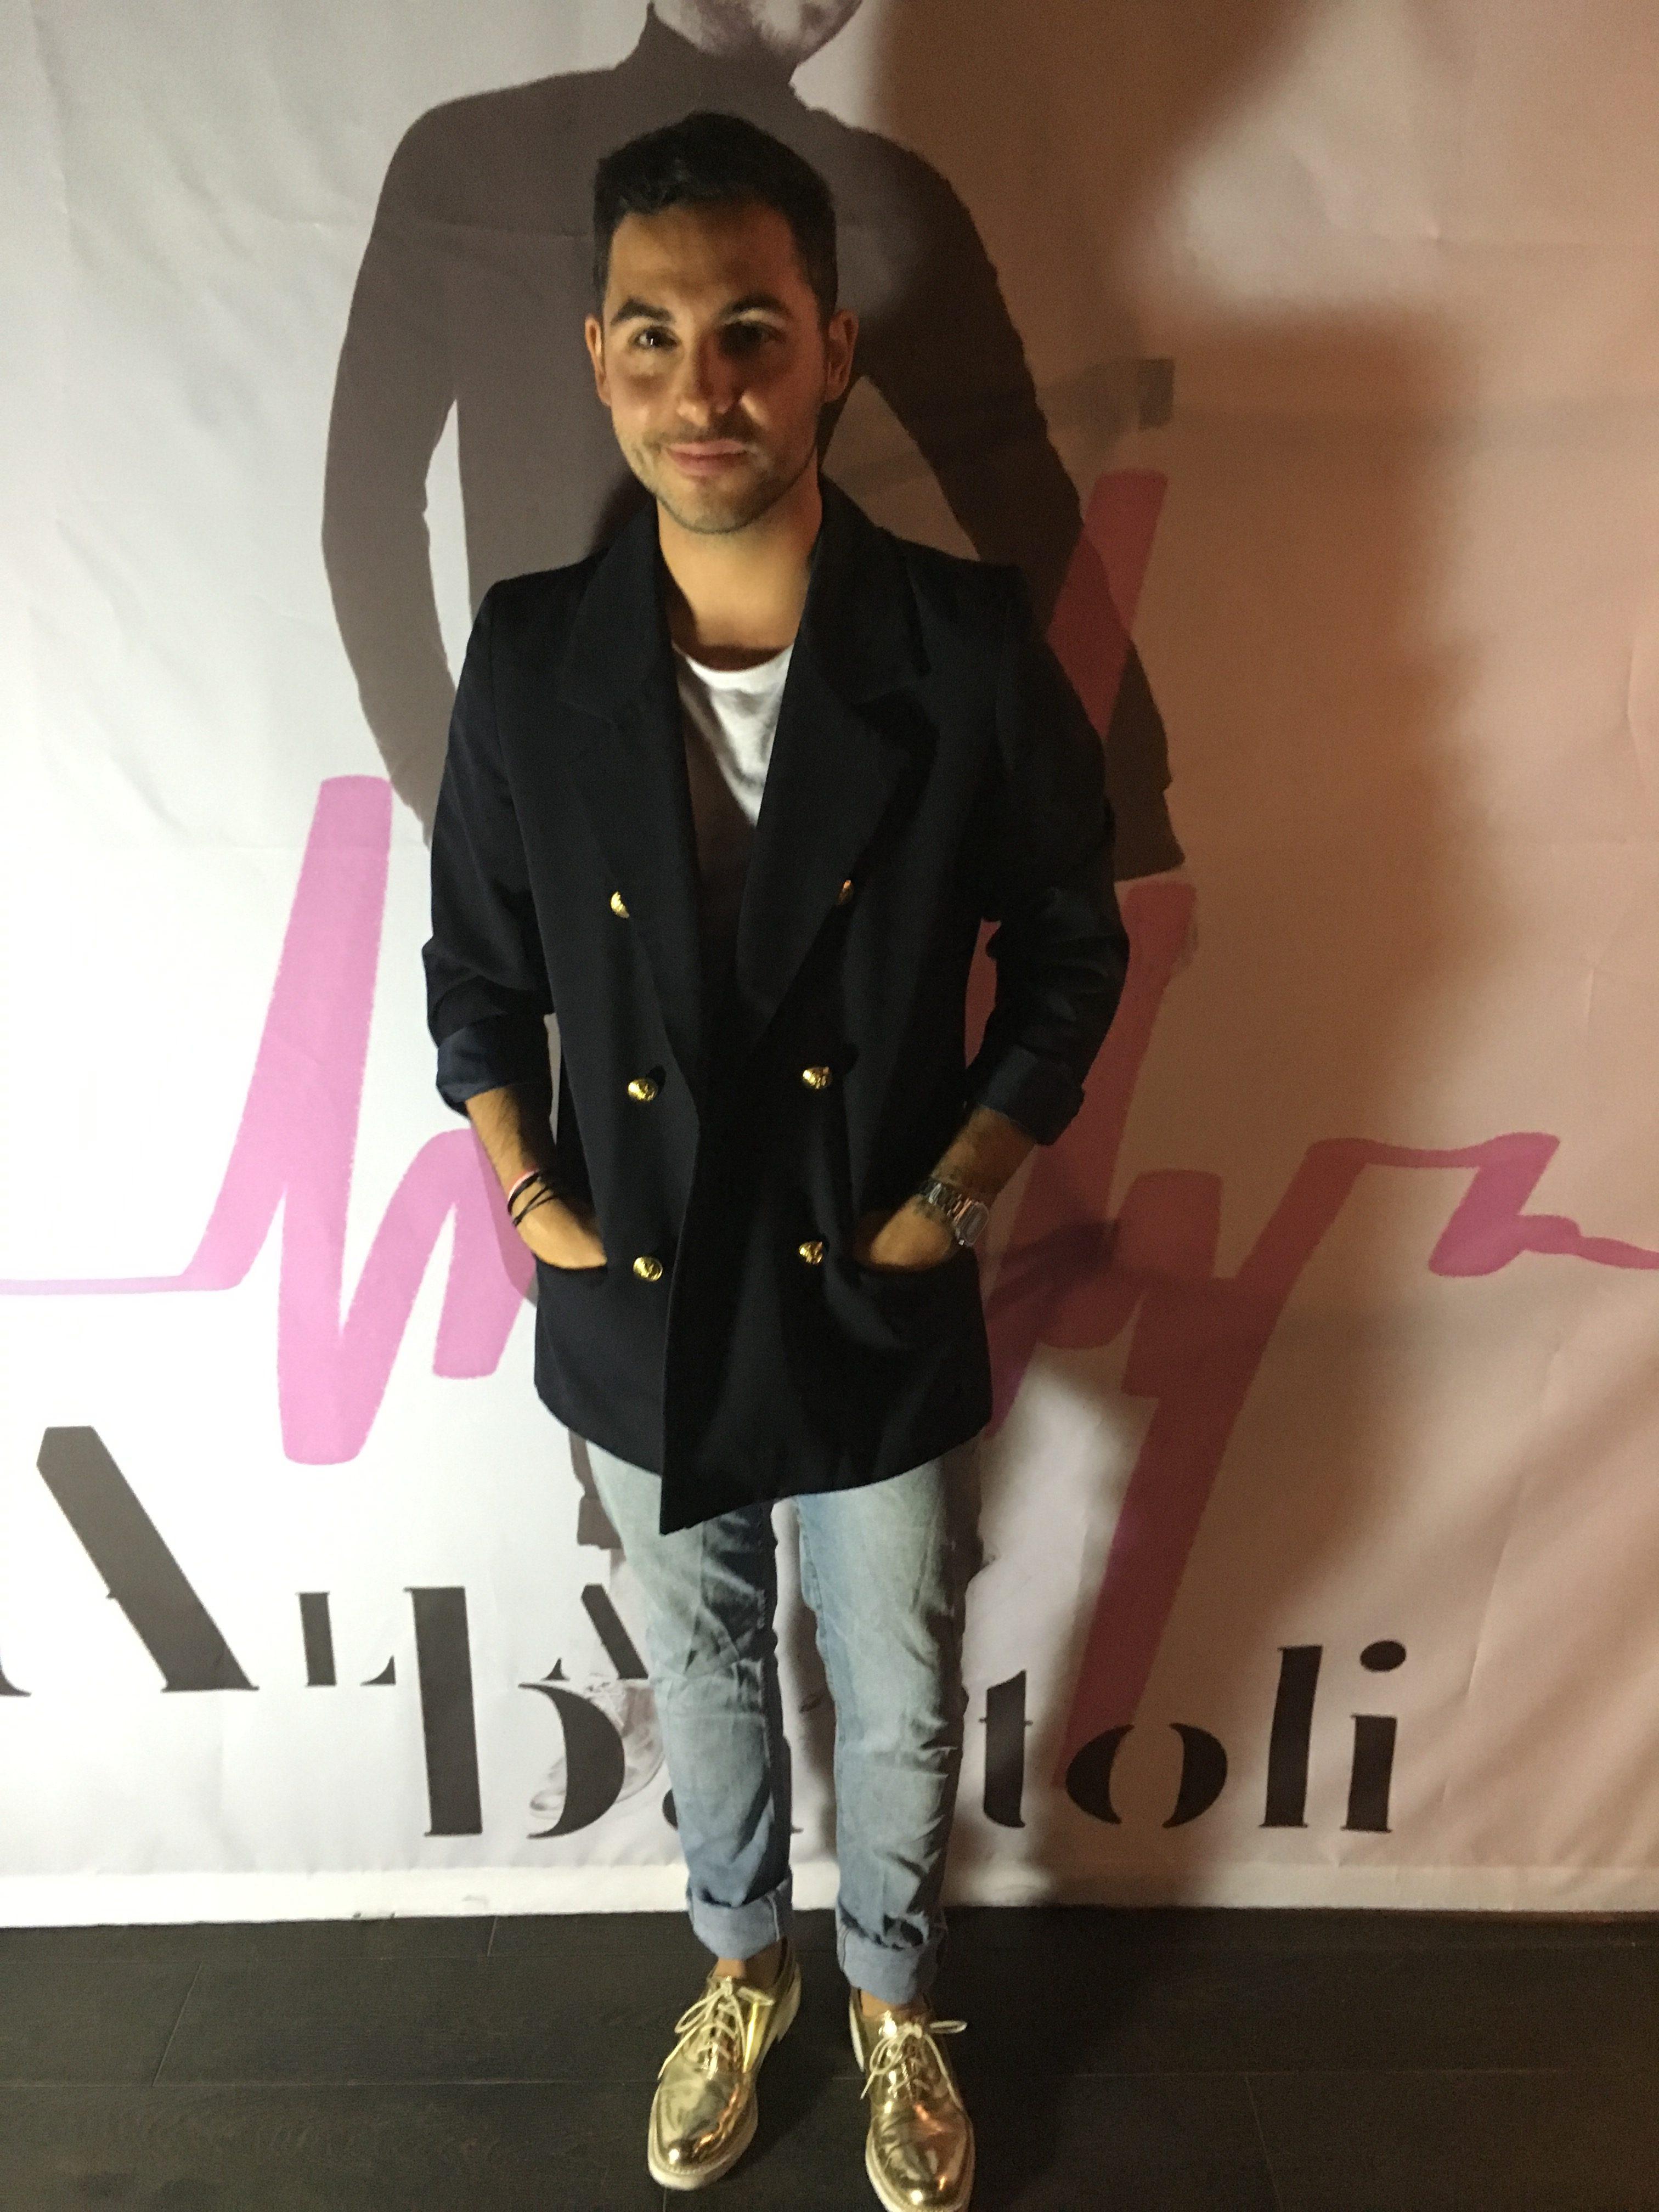 on-y-etait-showcase-dalban-bartoli-2016